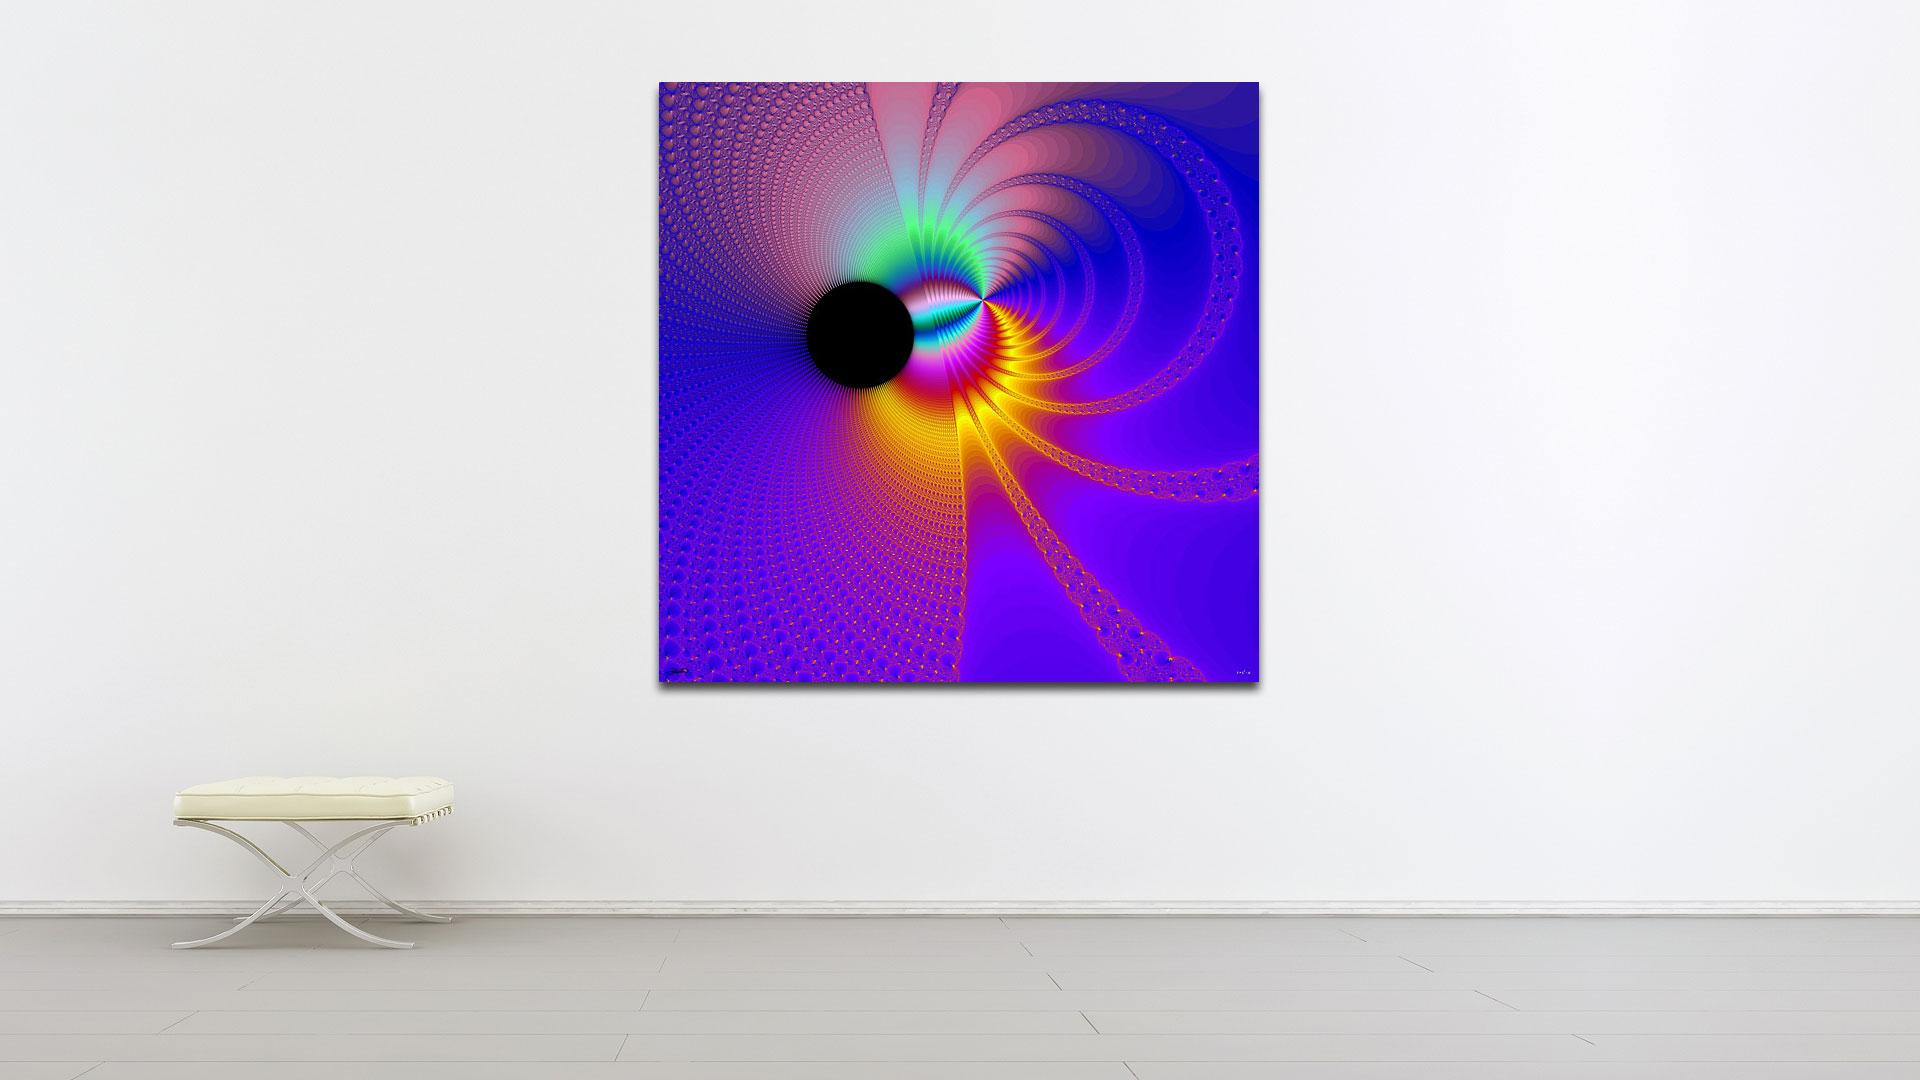 Supernova by Don Bristow